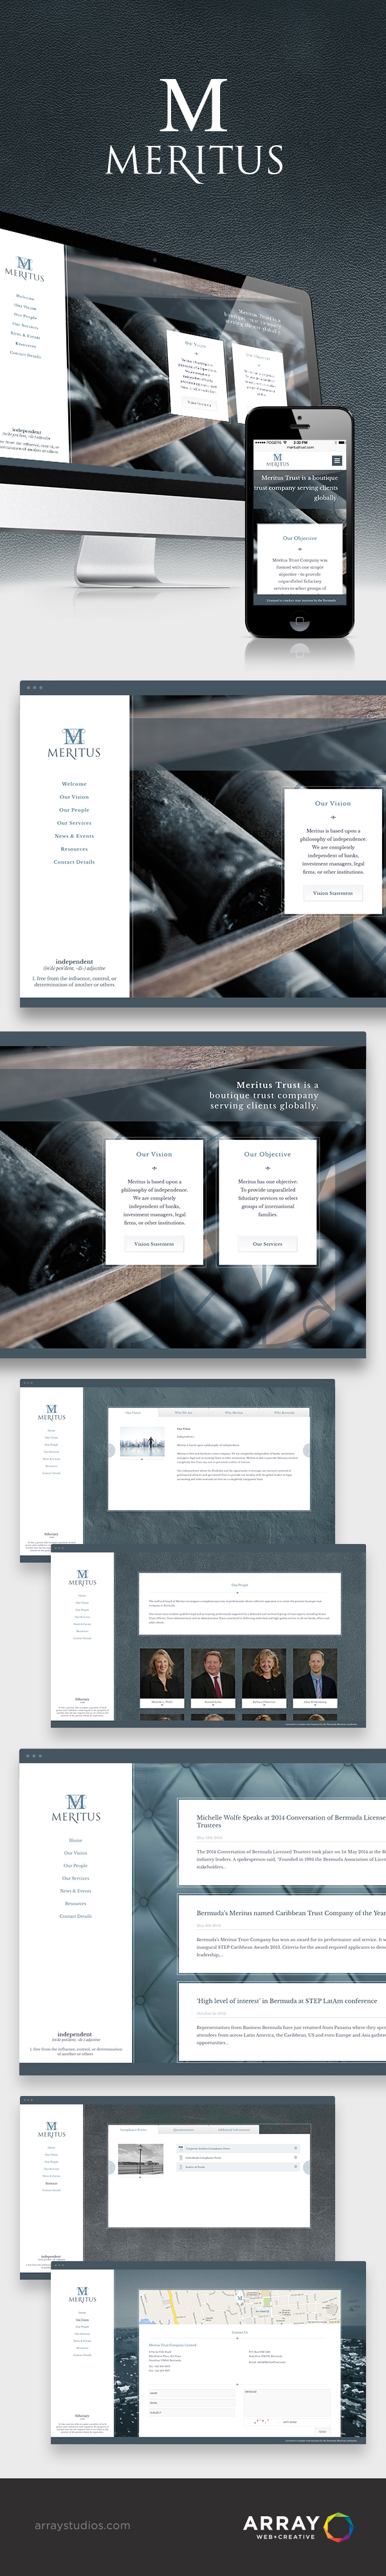 Website Launch Meritus Trust Array Web Creative Nanaimo Website Launch Web Design Inspiration Design Development